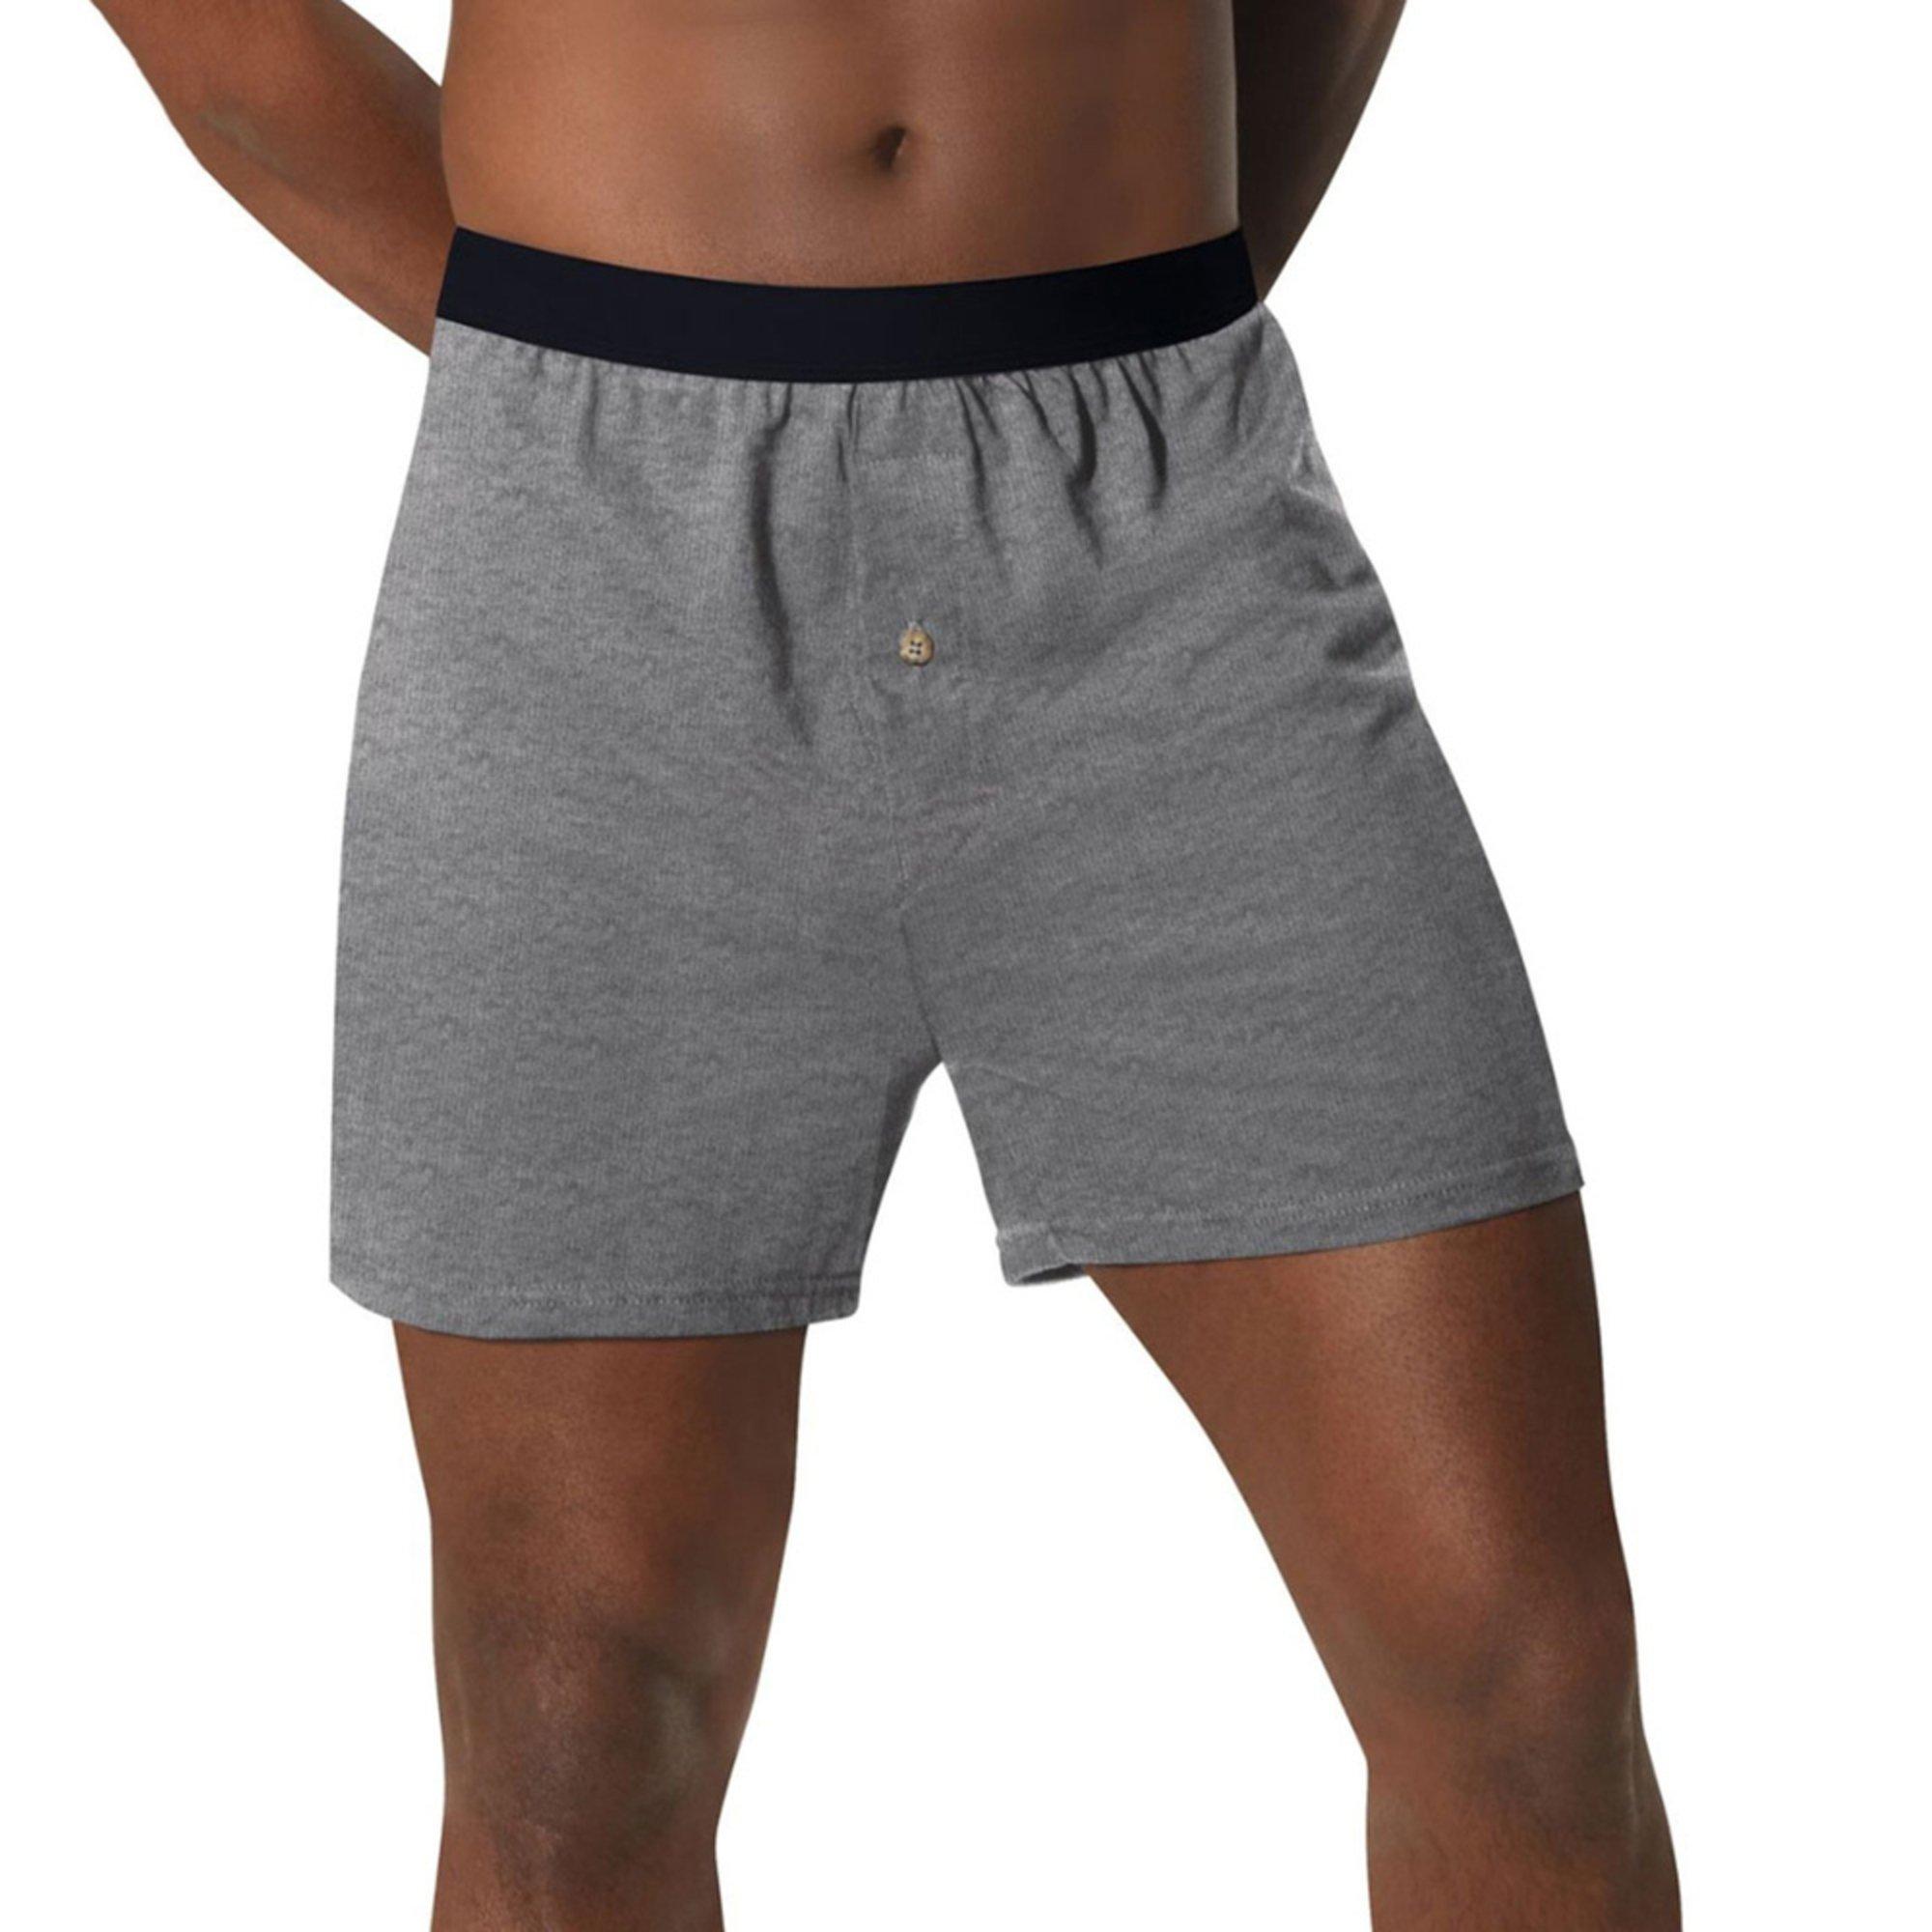 fdb18a0c8cd7 Hanes Men's 5-pack Knit Boxers | Men's Underwear | Apparel - Shop ...